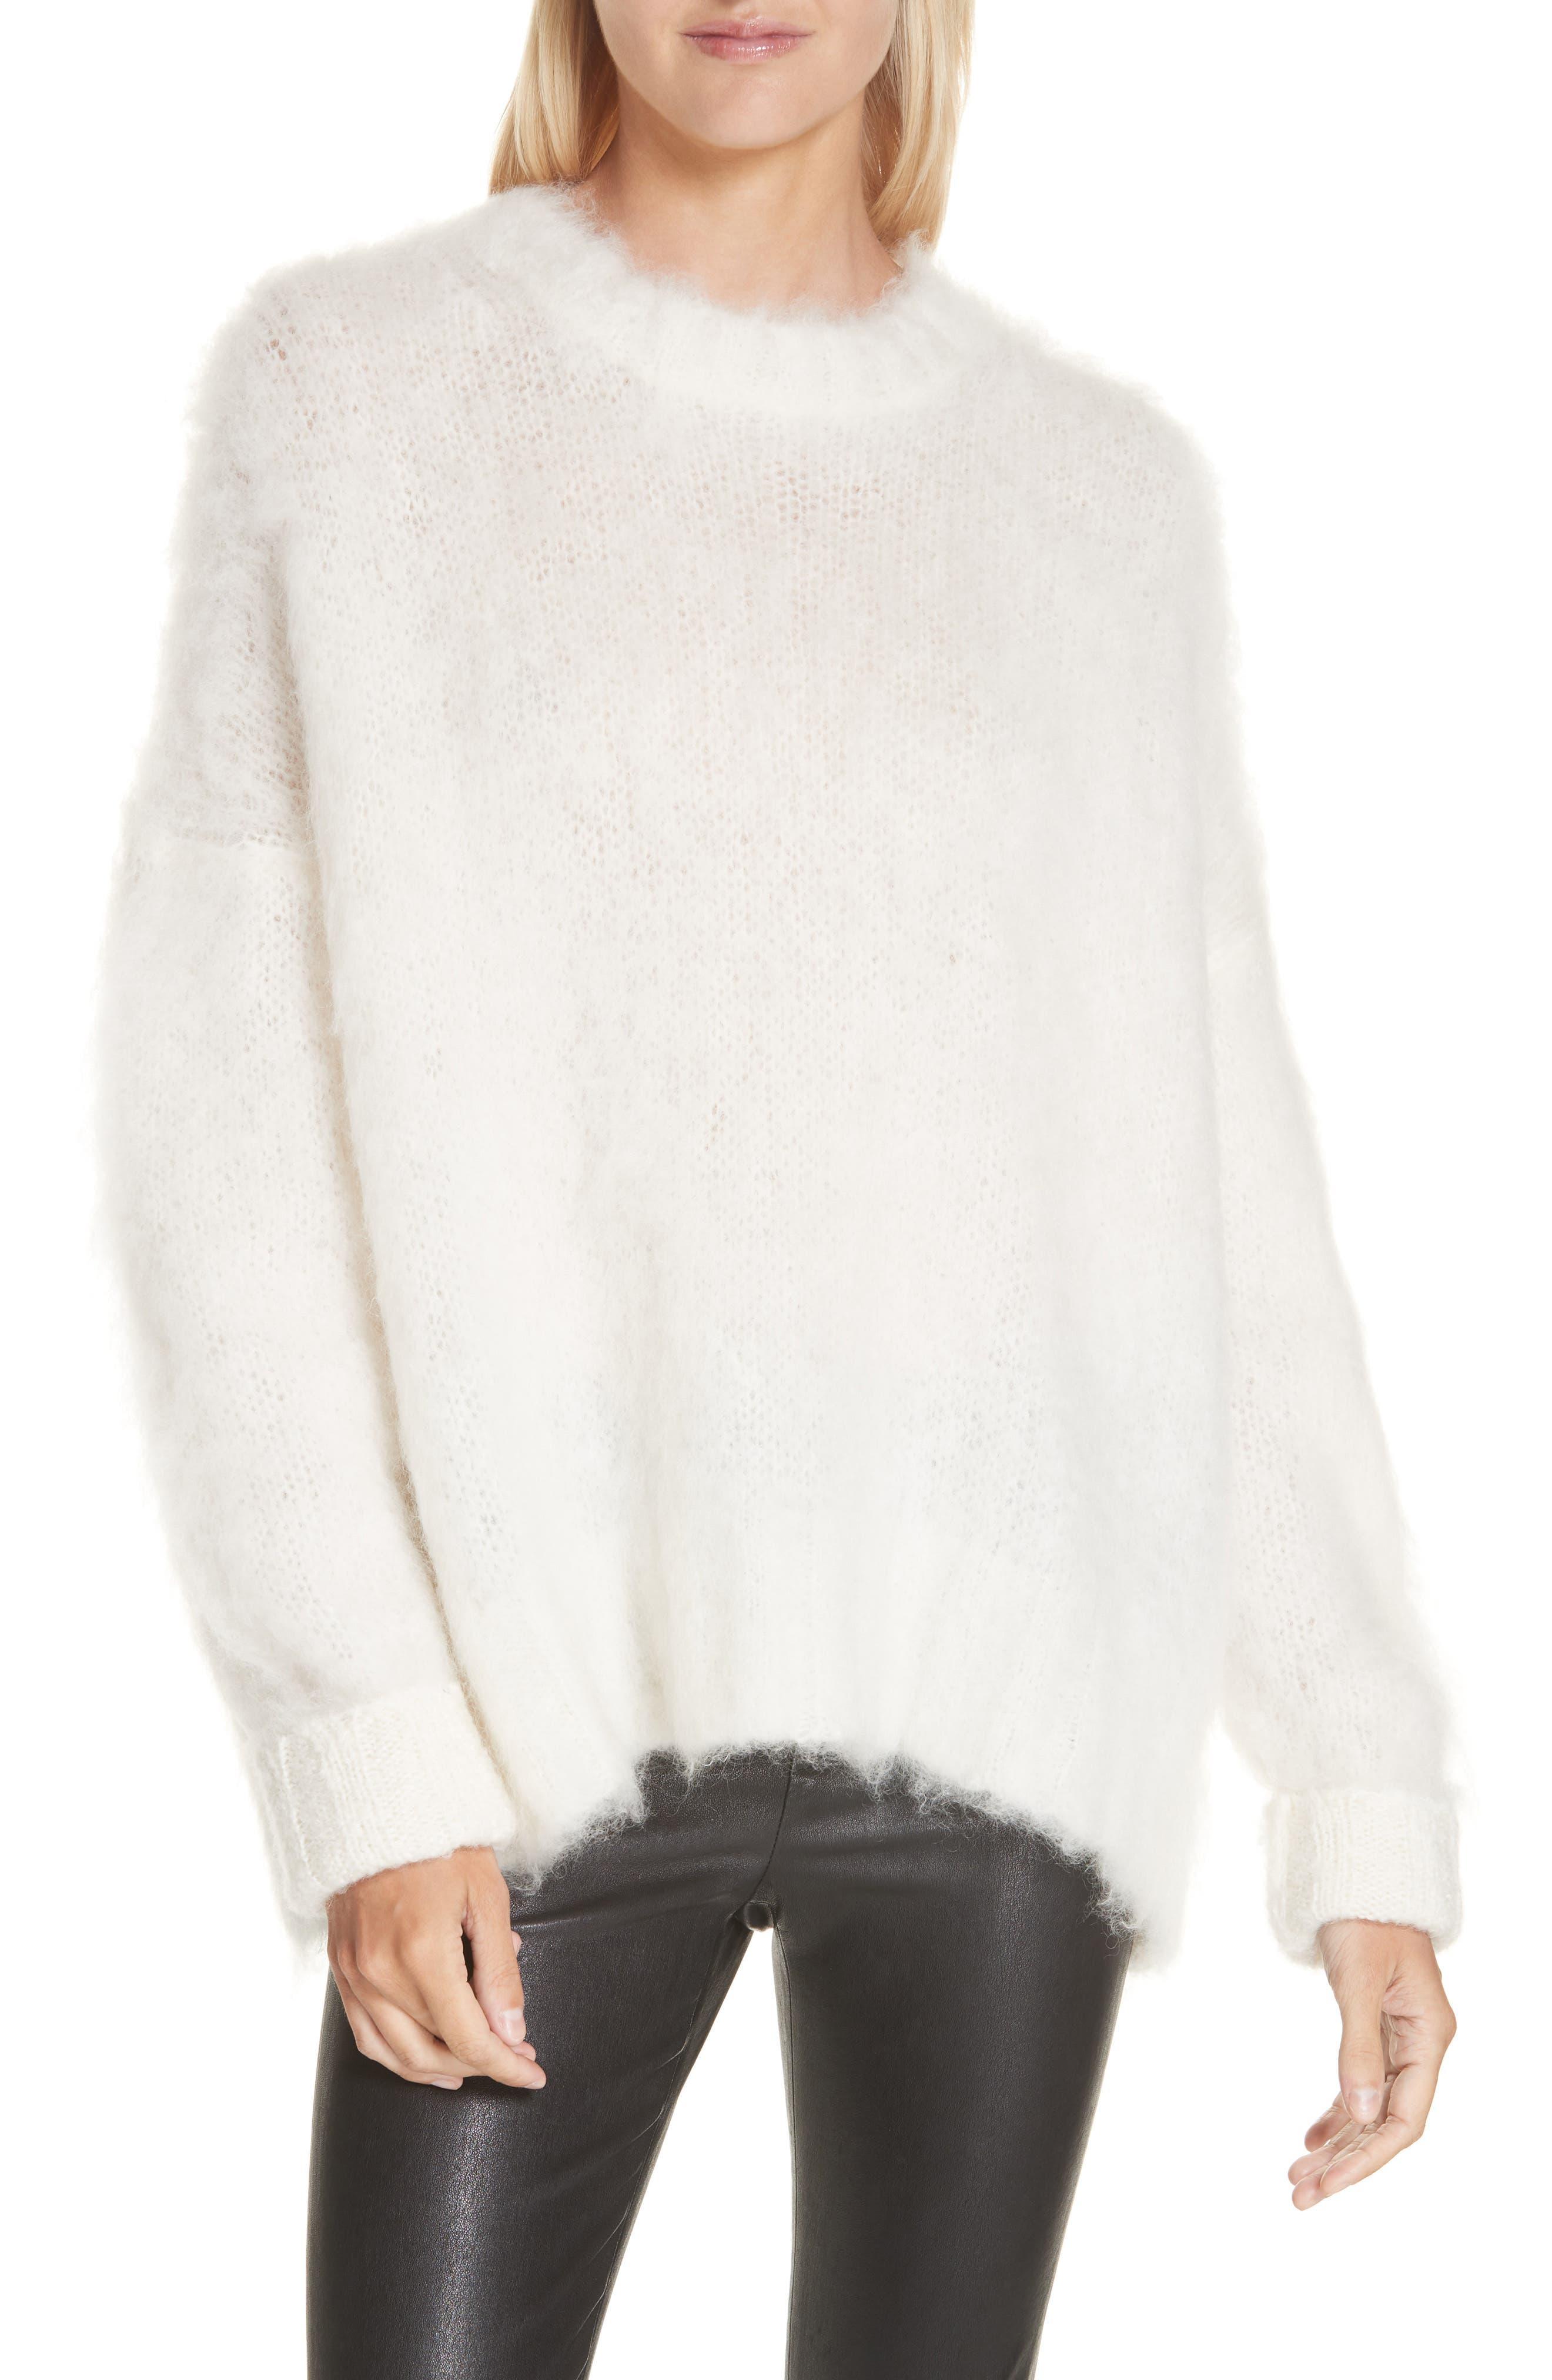 HELMUT LANG, Mohair Blend Sweater, Main thumbnail 1, color, NATURAL WHITE